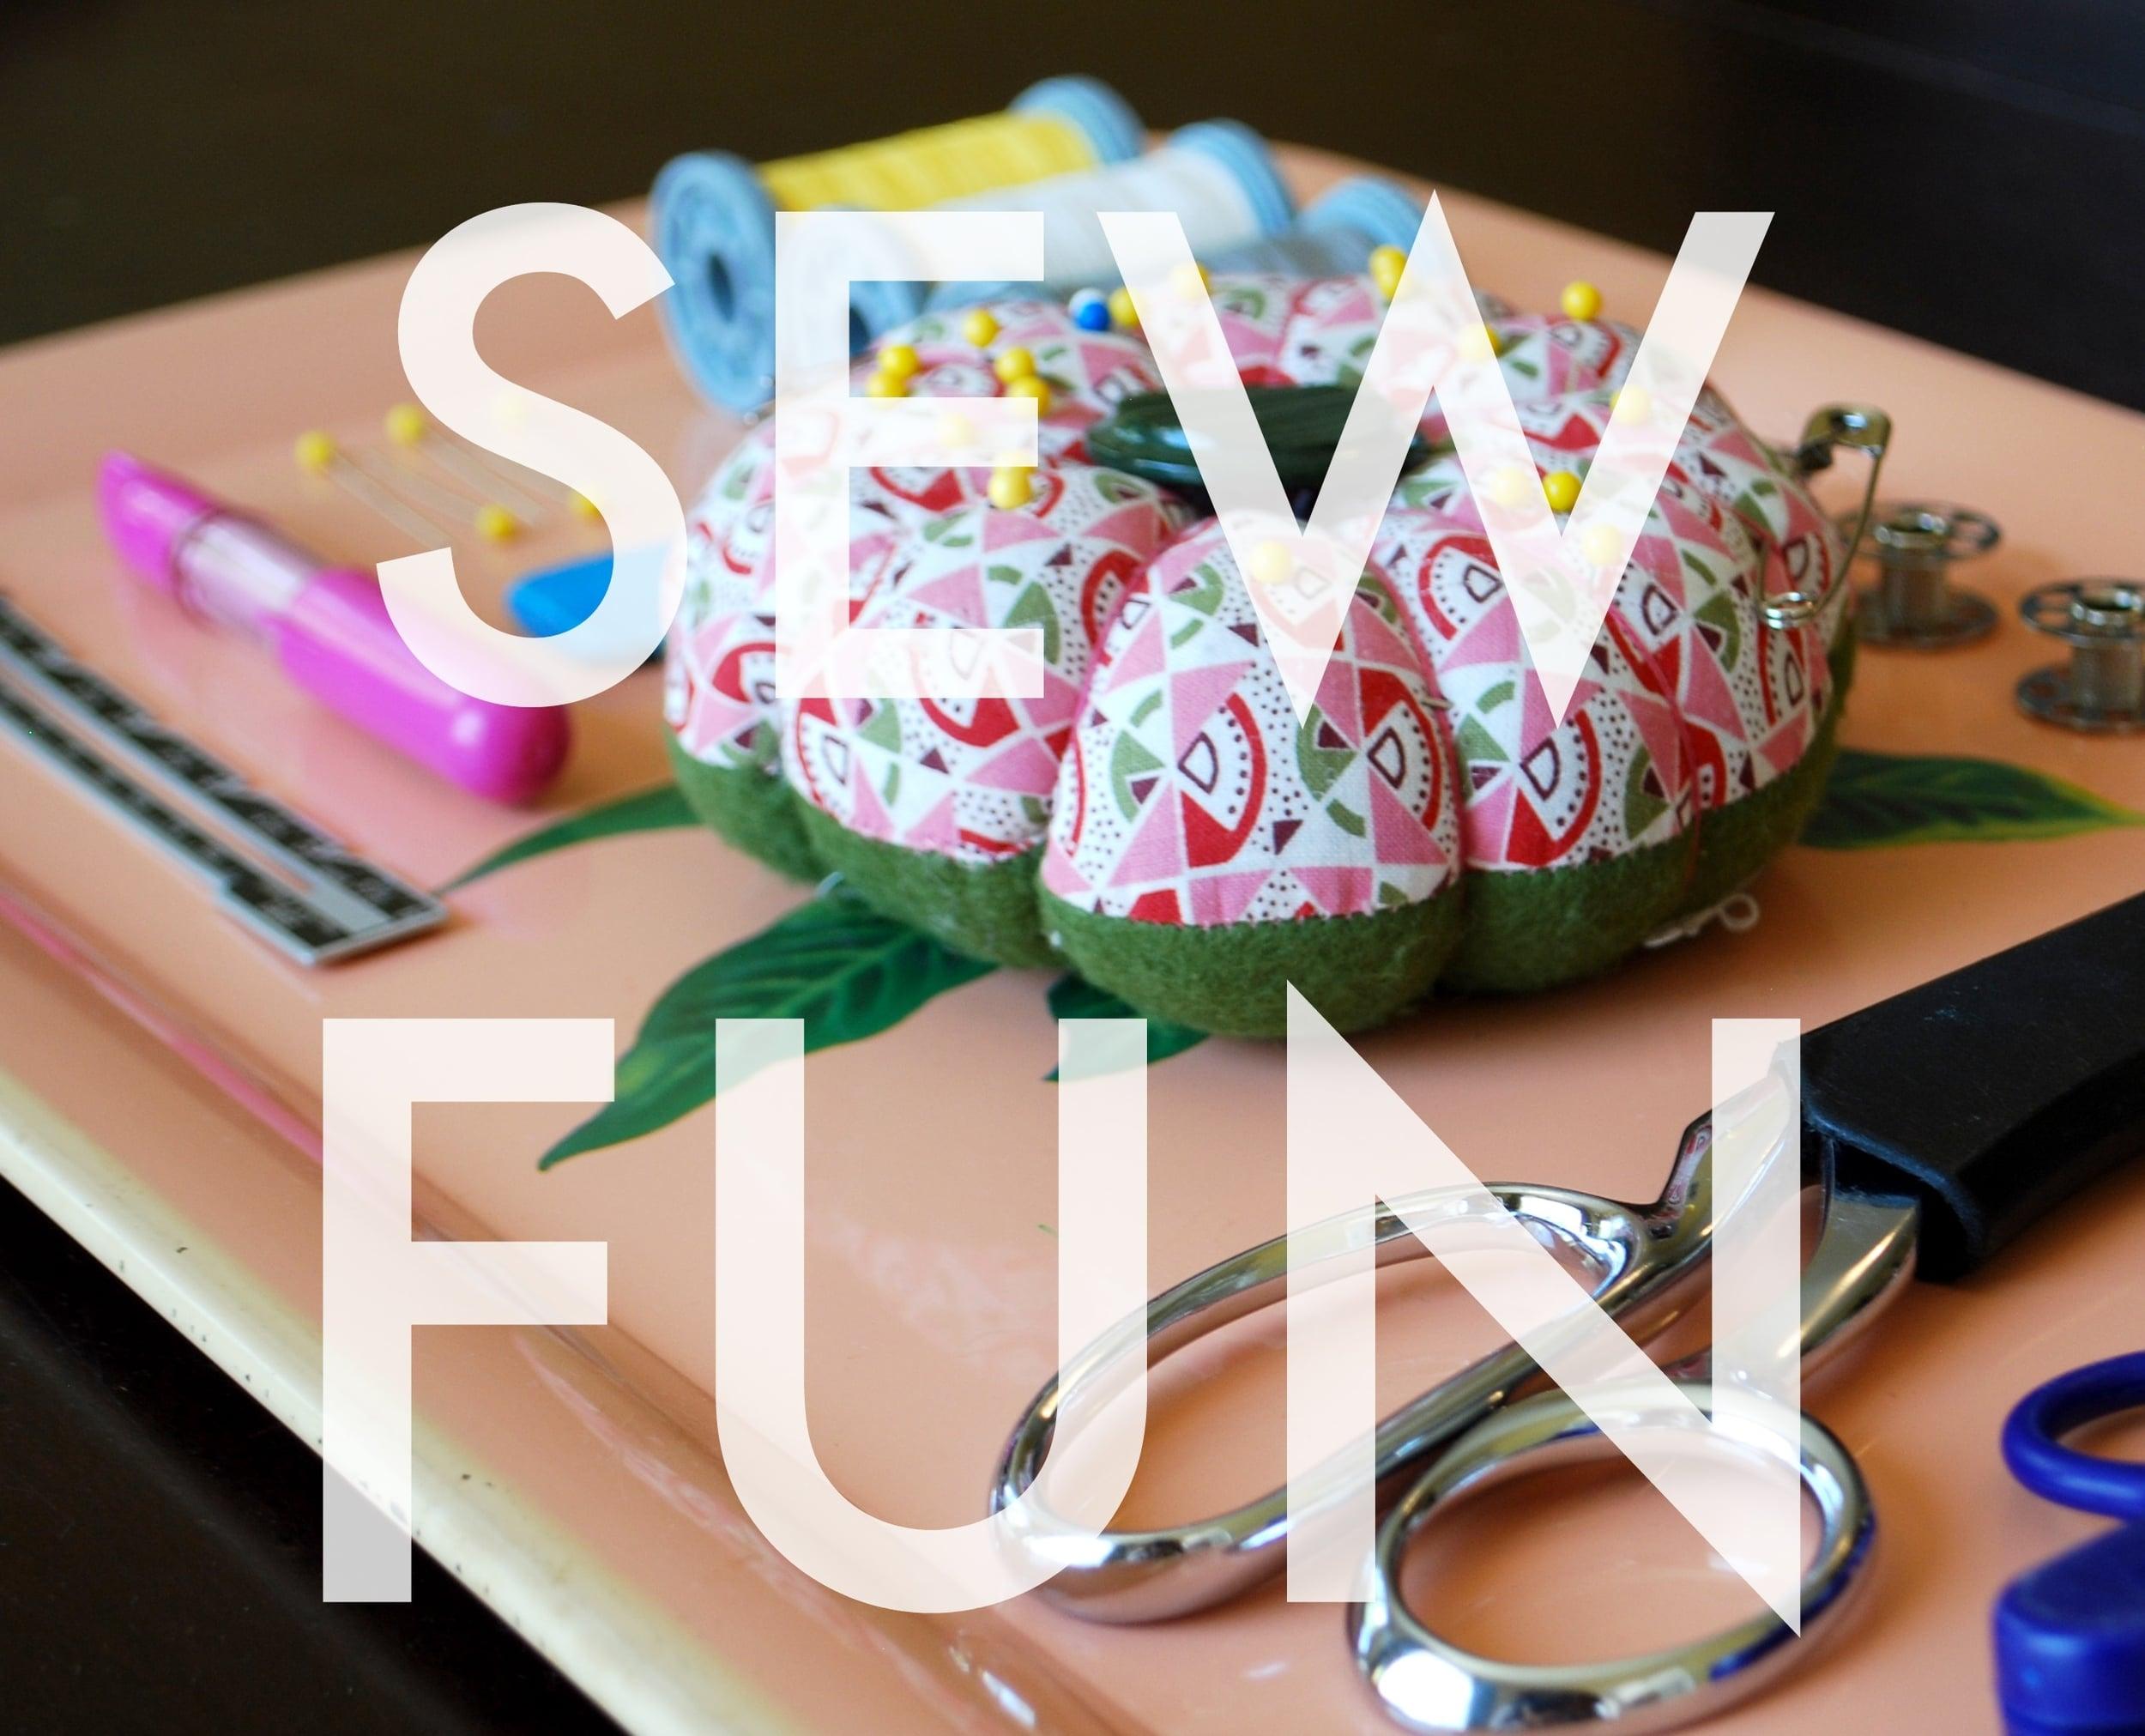 Sew Fun Workshop | Sew You Studio.com